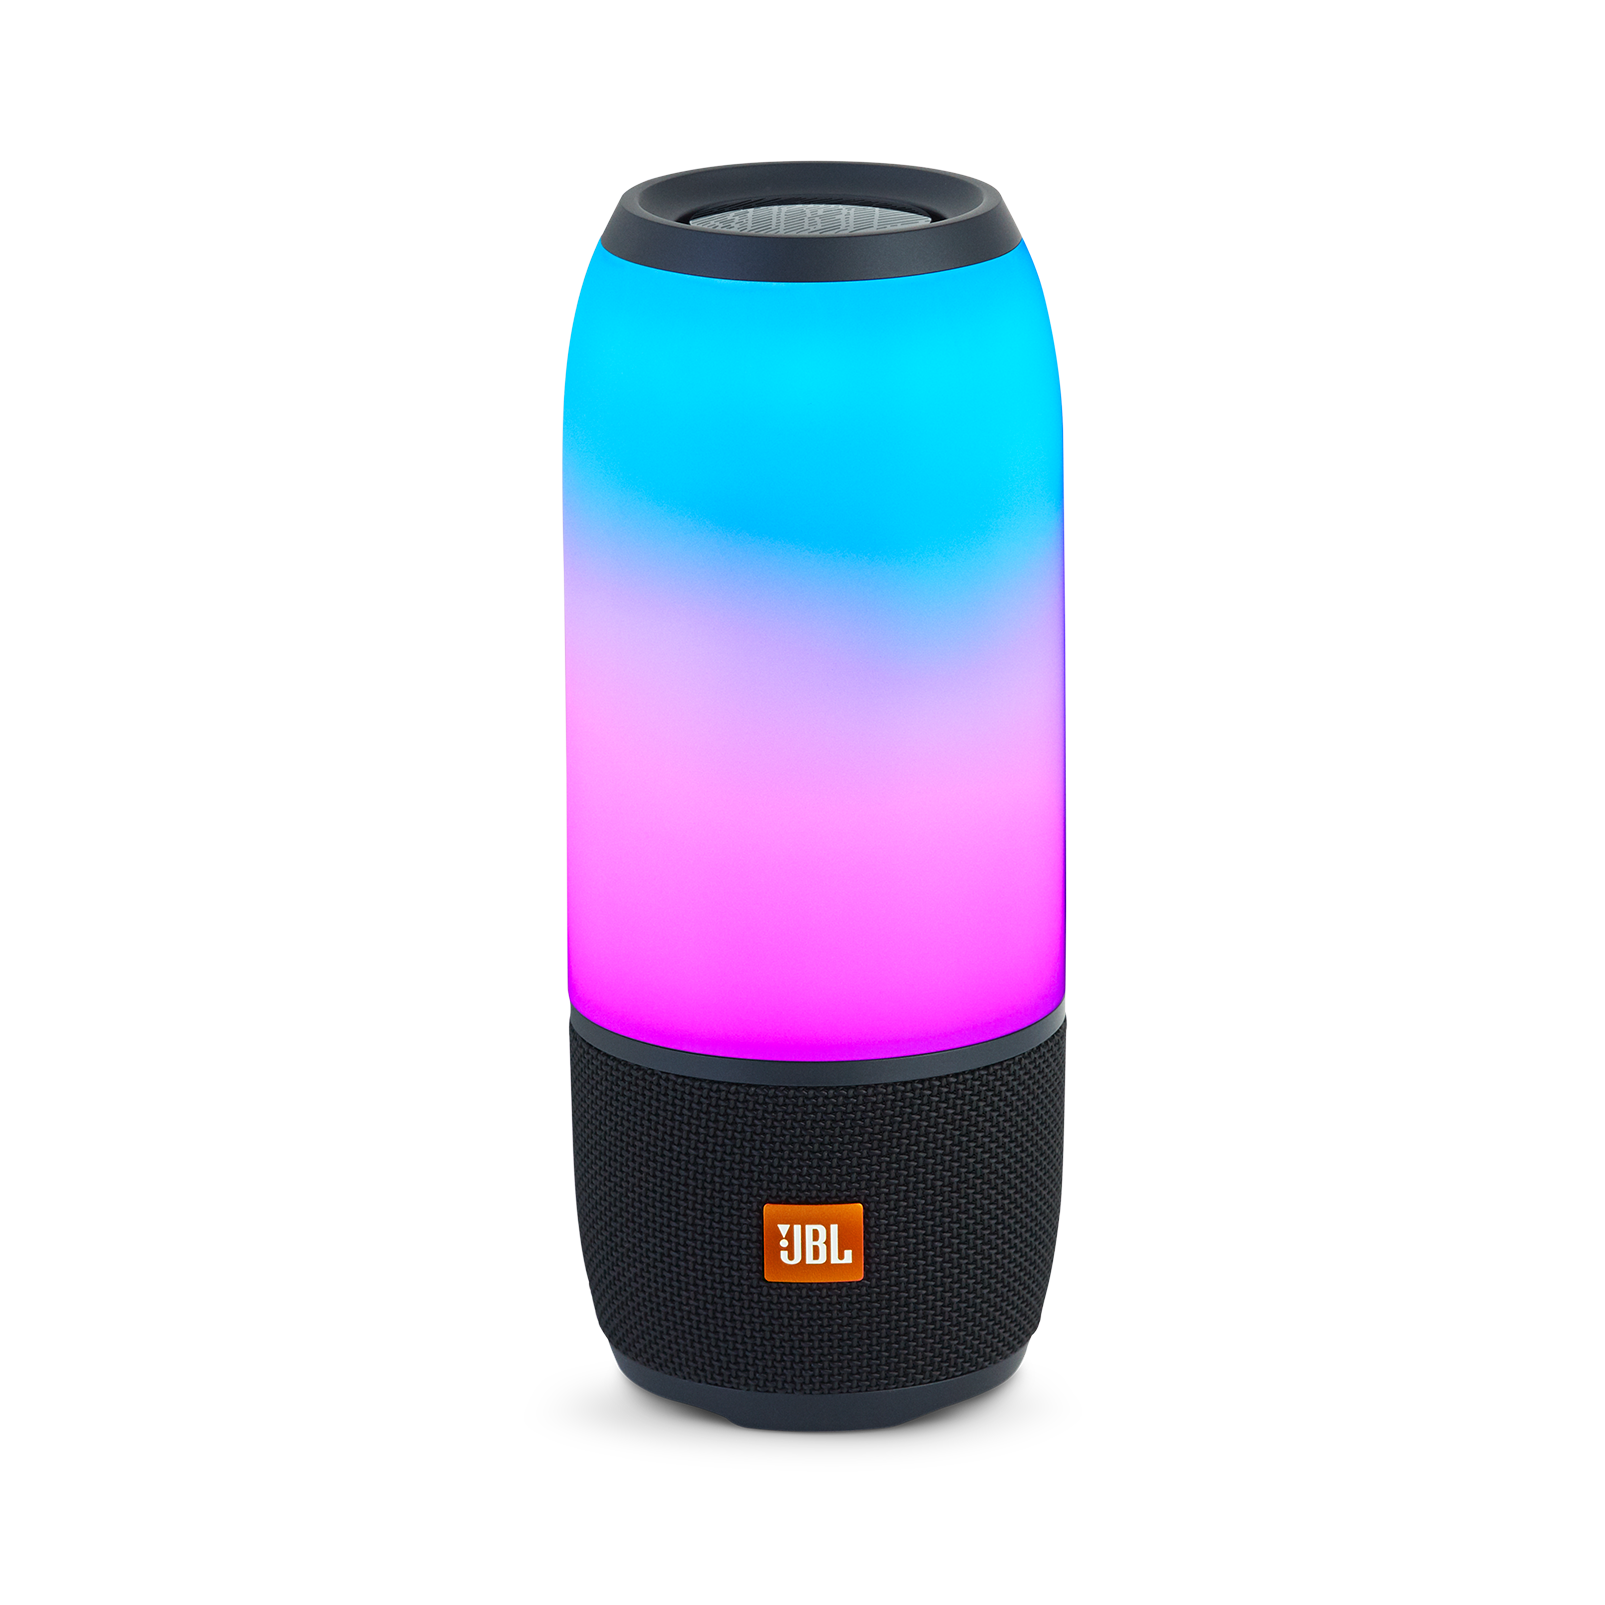 JBL Pulse 3 Portable Wireless Speaker - Black (PULSE3-BK)